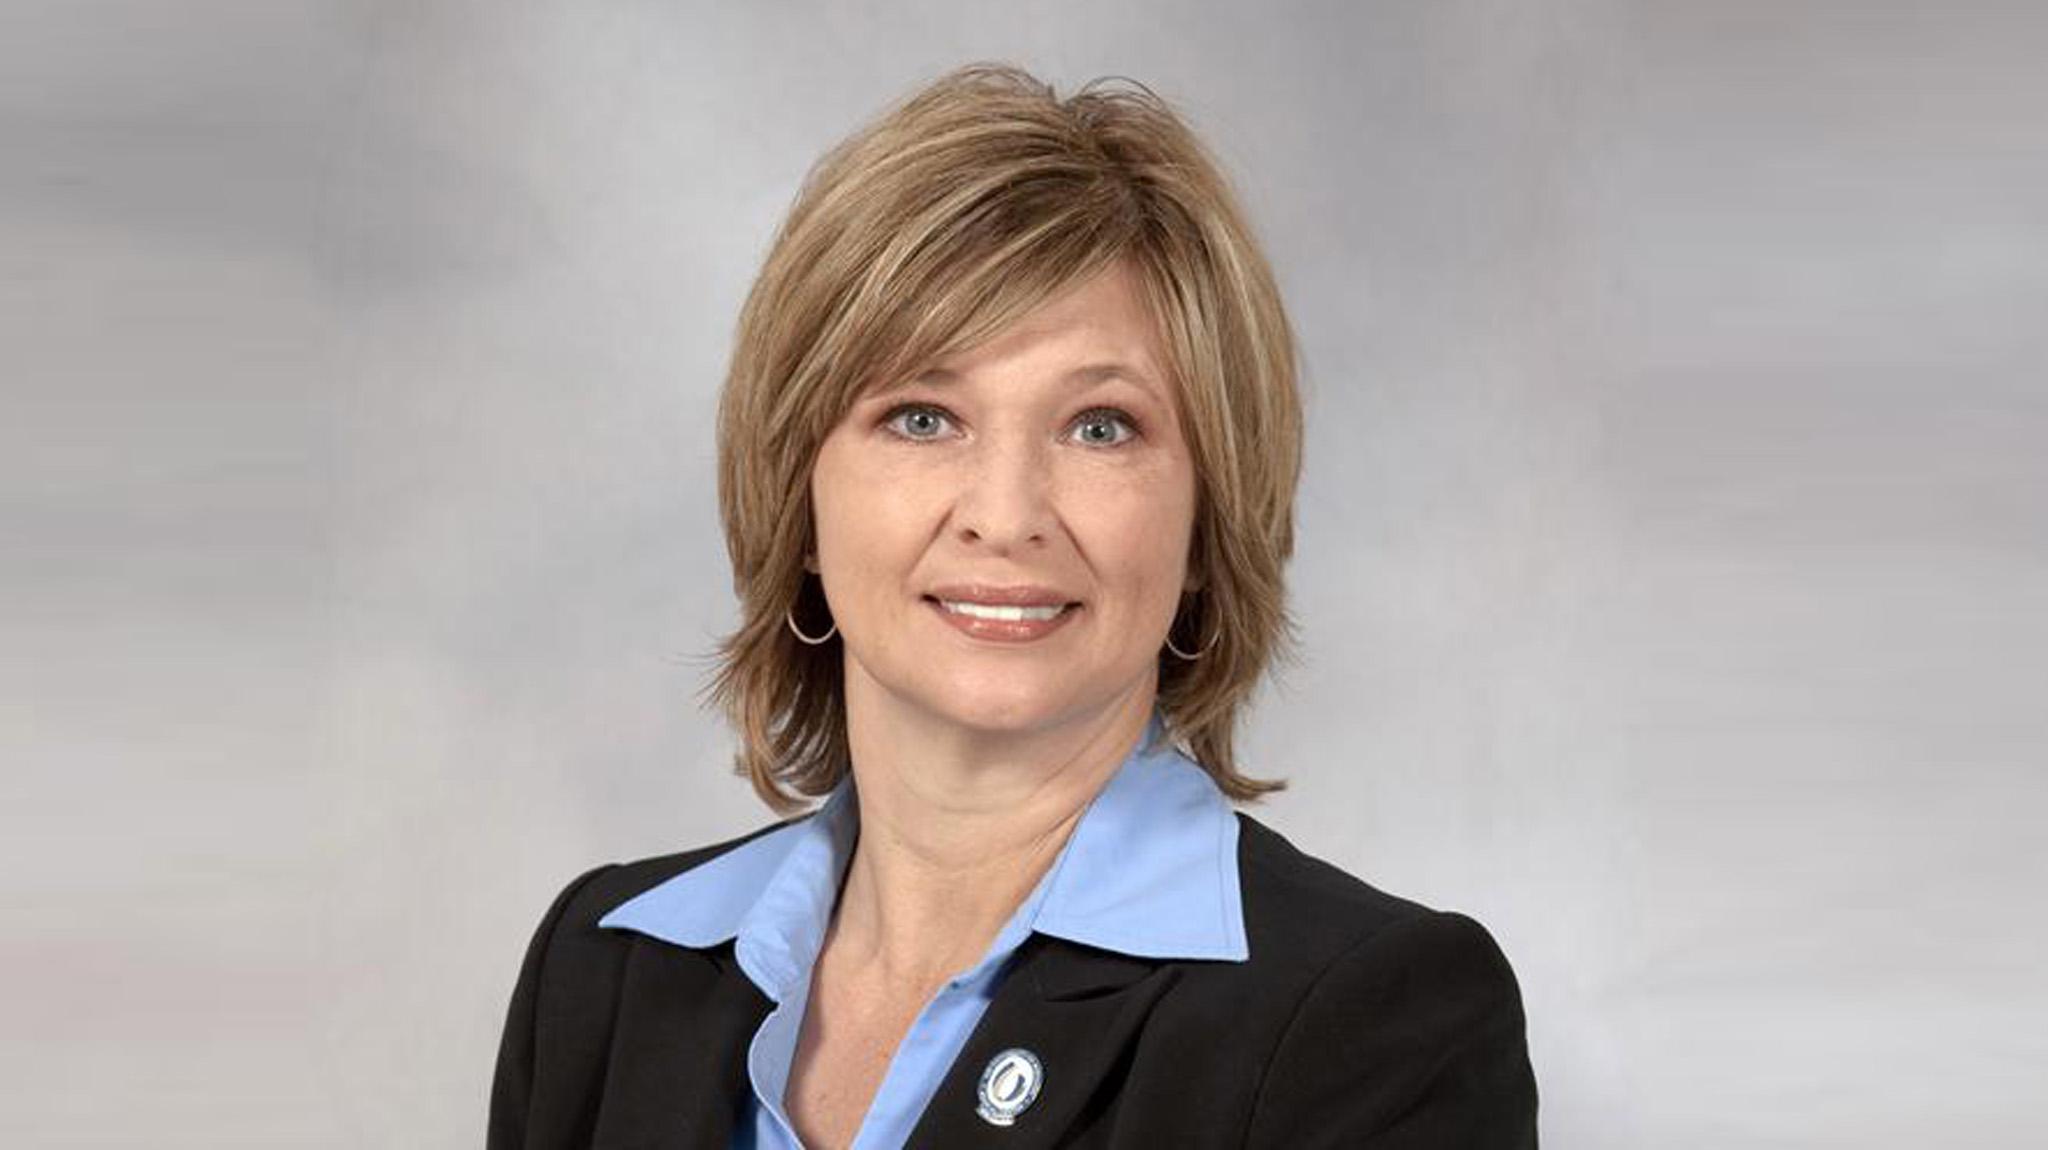 Mississippi Native Chosen to Lead UM Medical Center